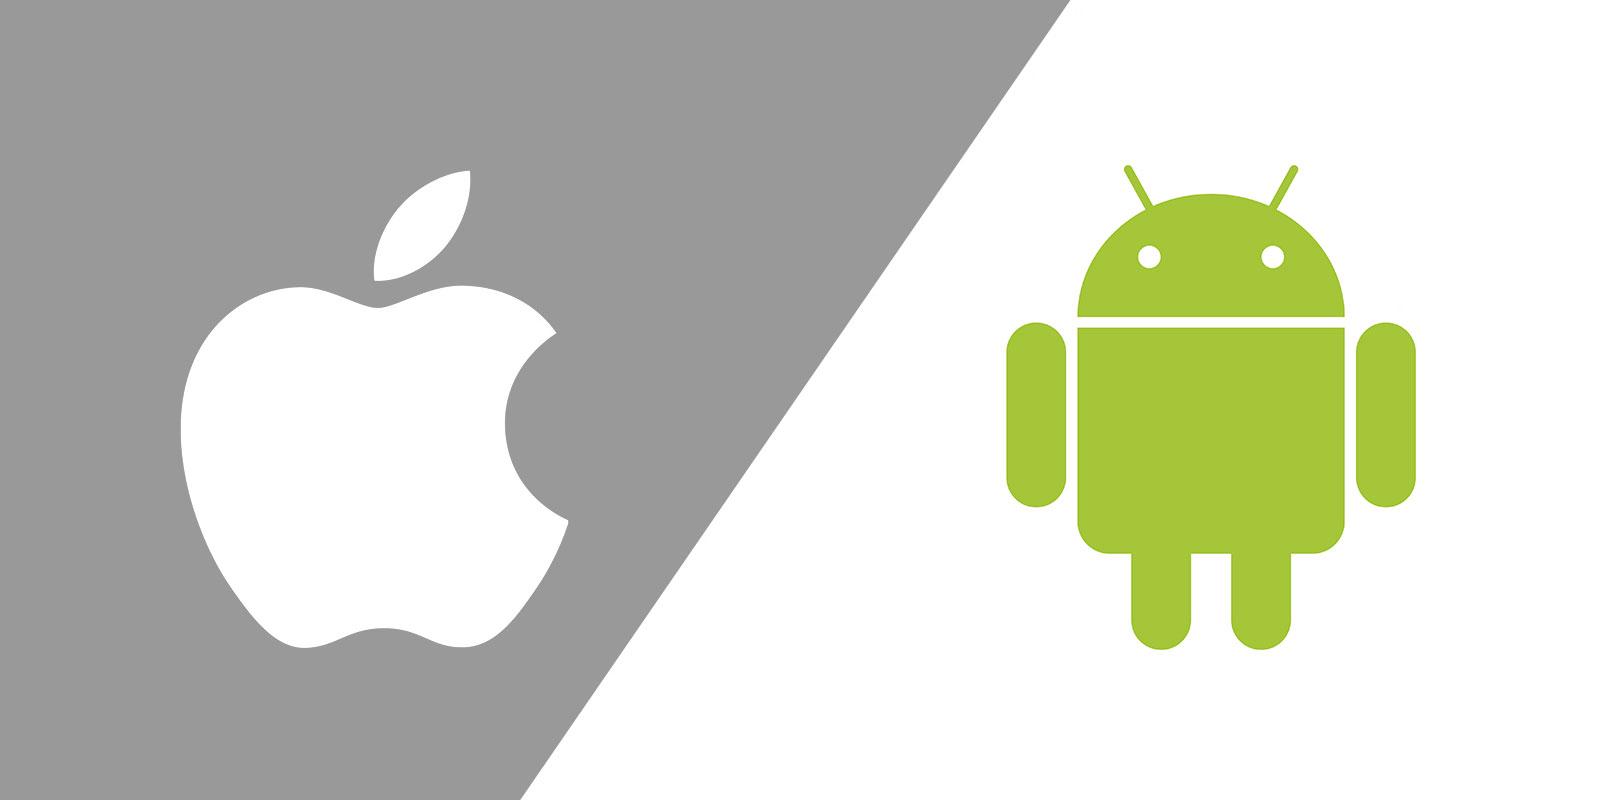 obektivnoe-sravnenie-ios-i-android-v-2019-godu_9_large.jpg